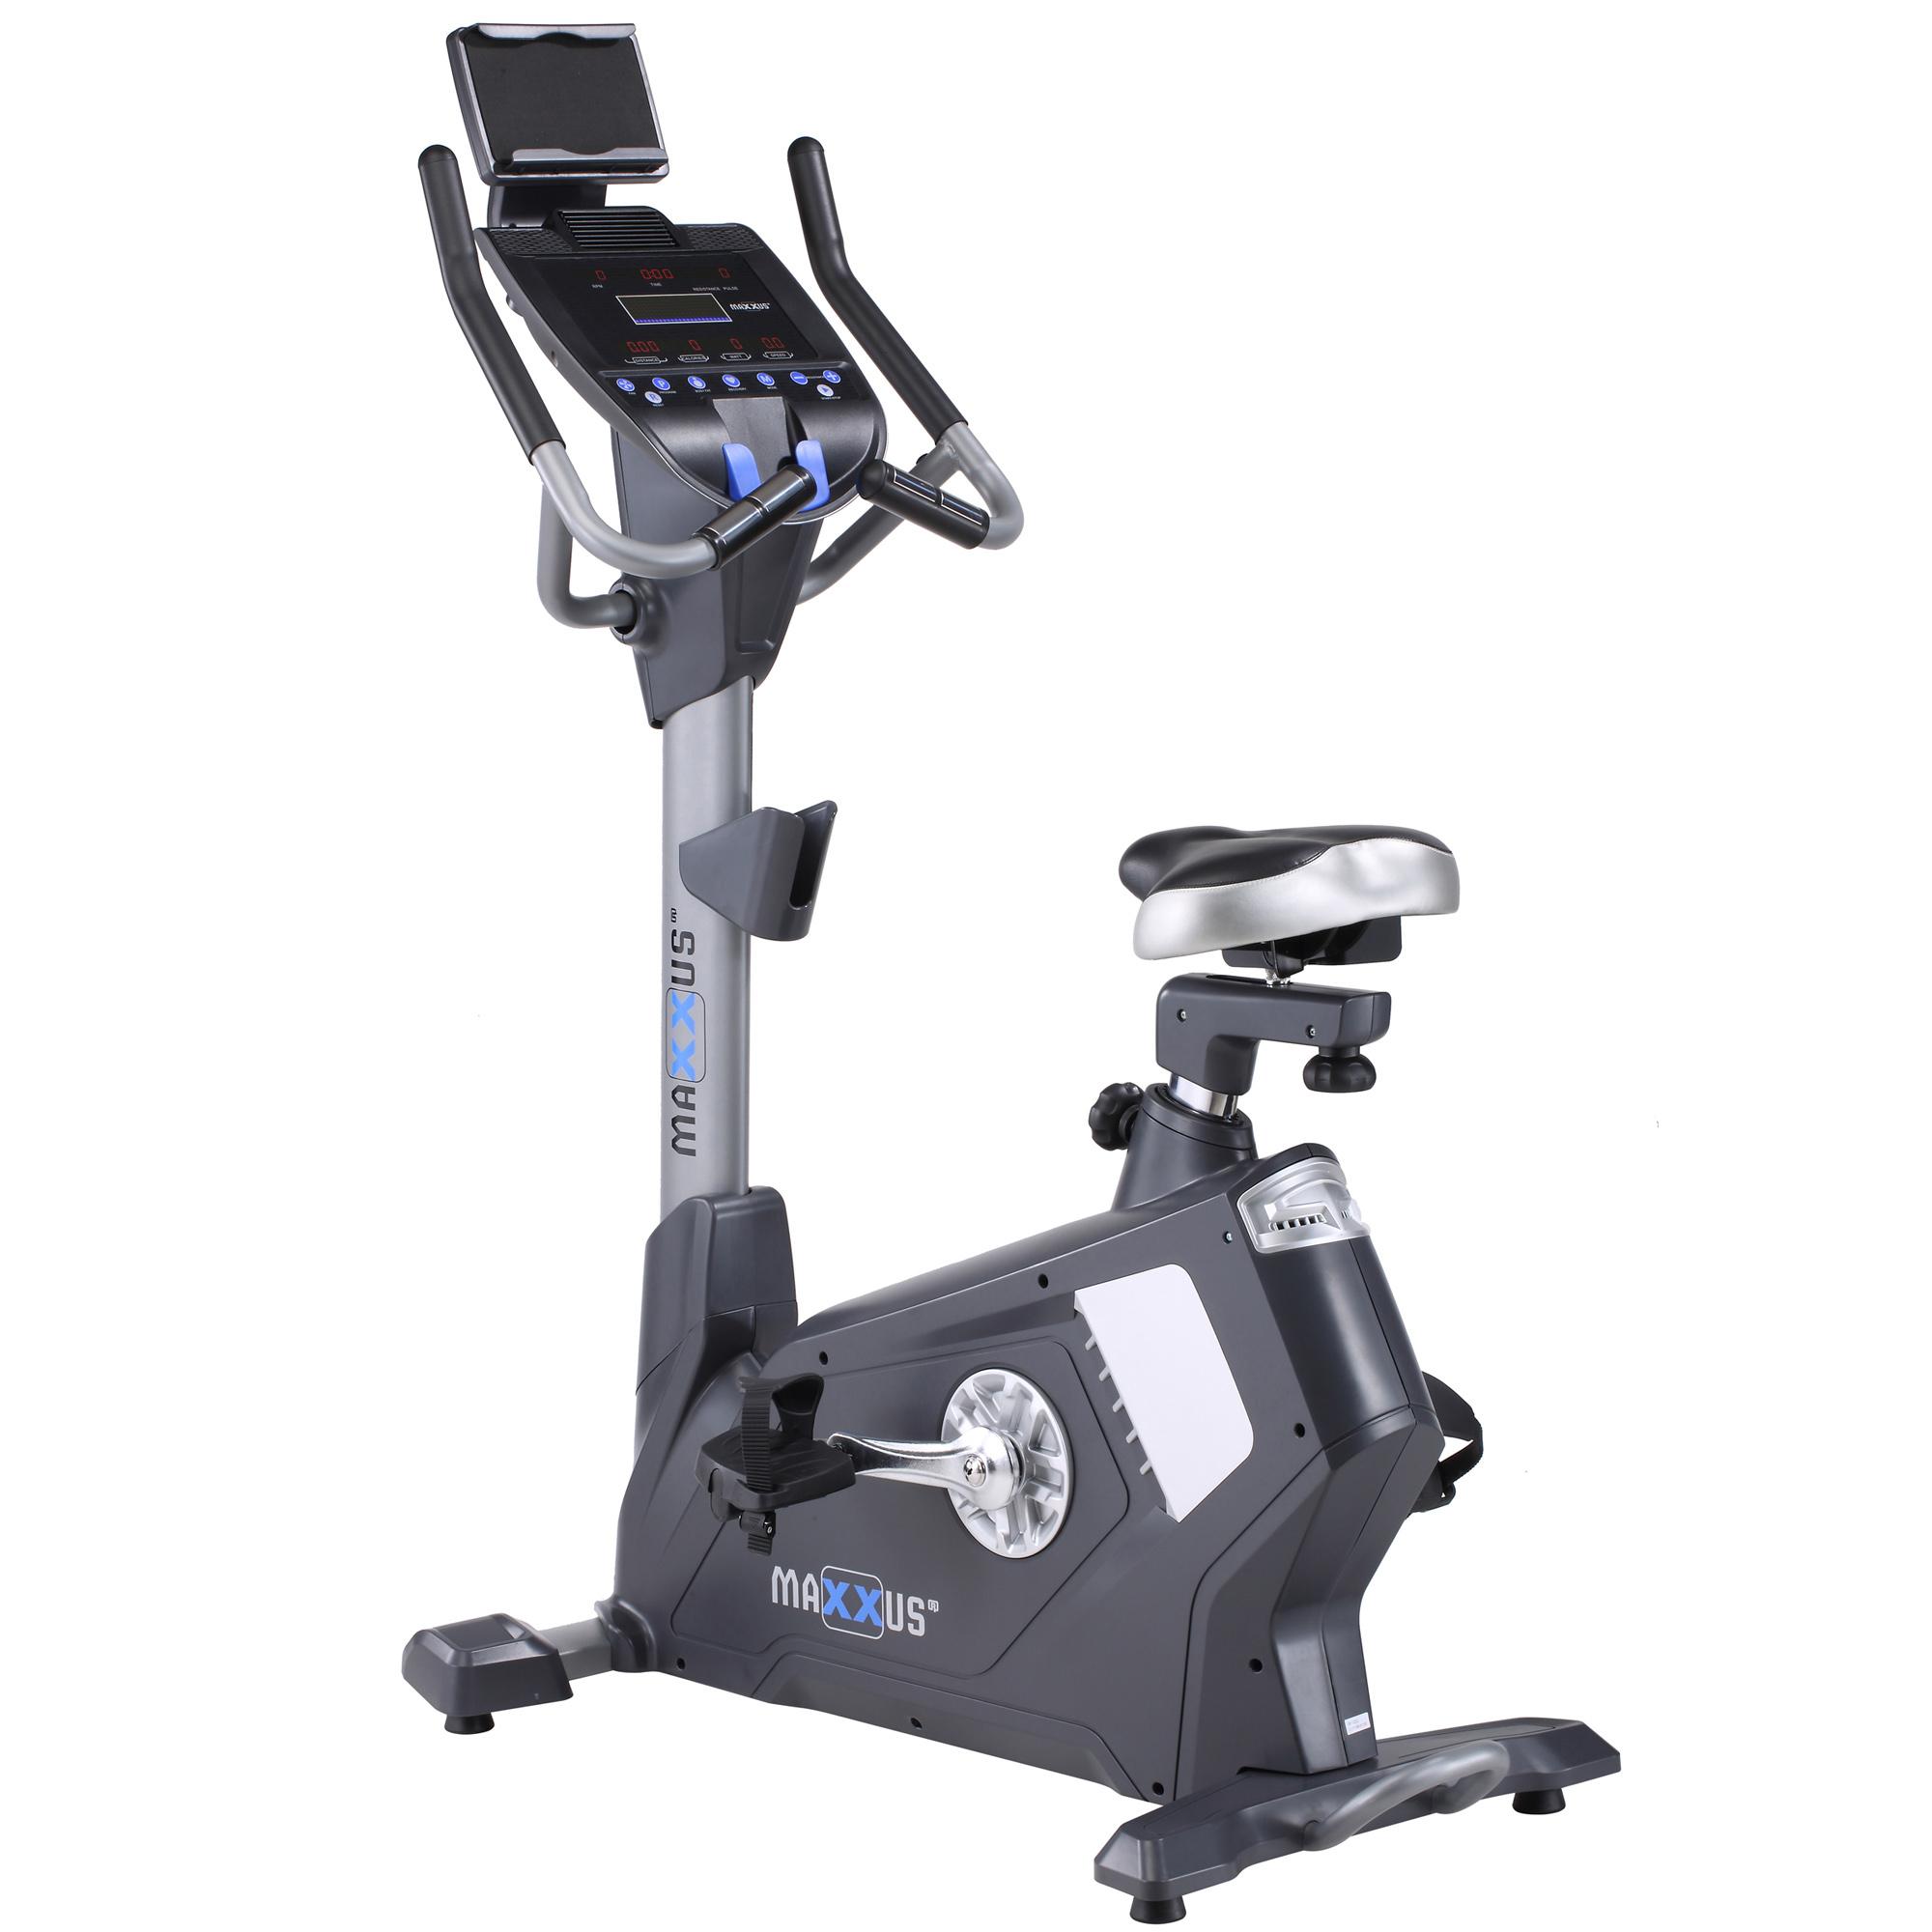 MAXXUS Ergometer Trainingscomputer MX-600053-00019-0001